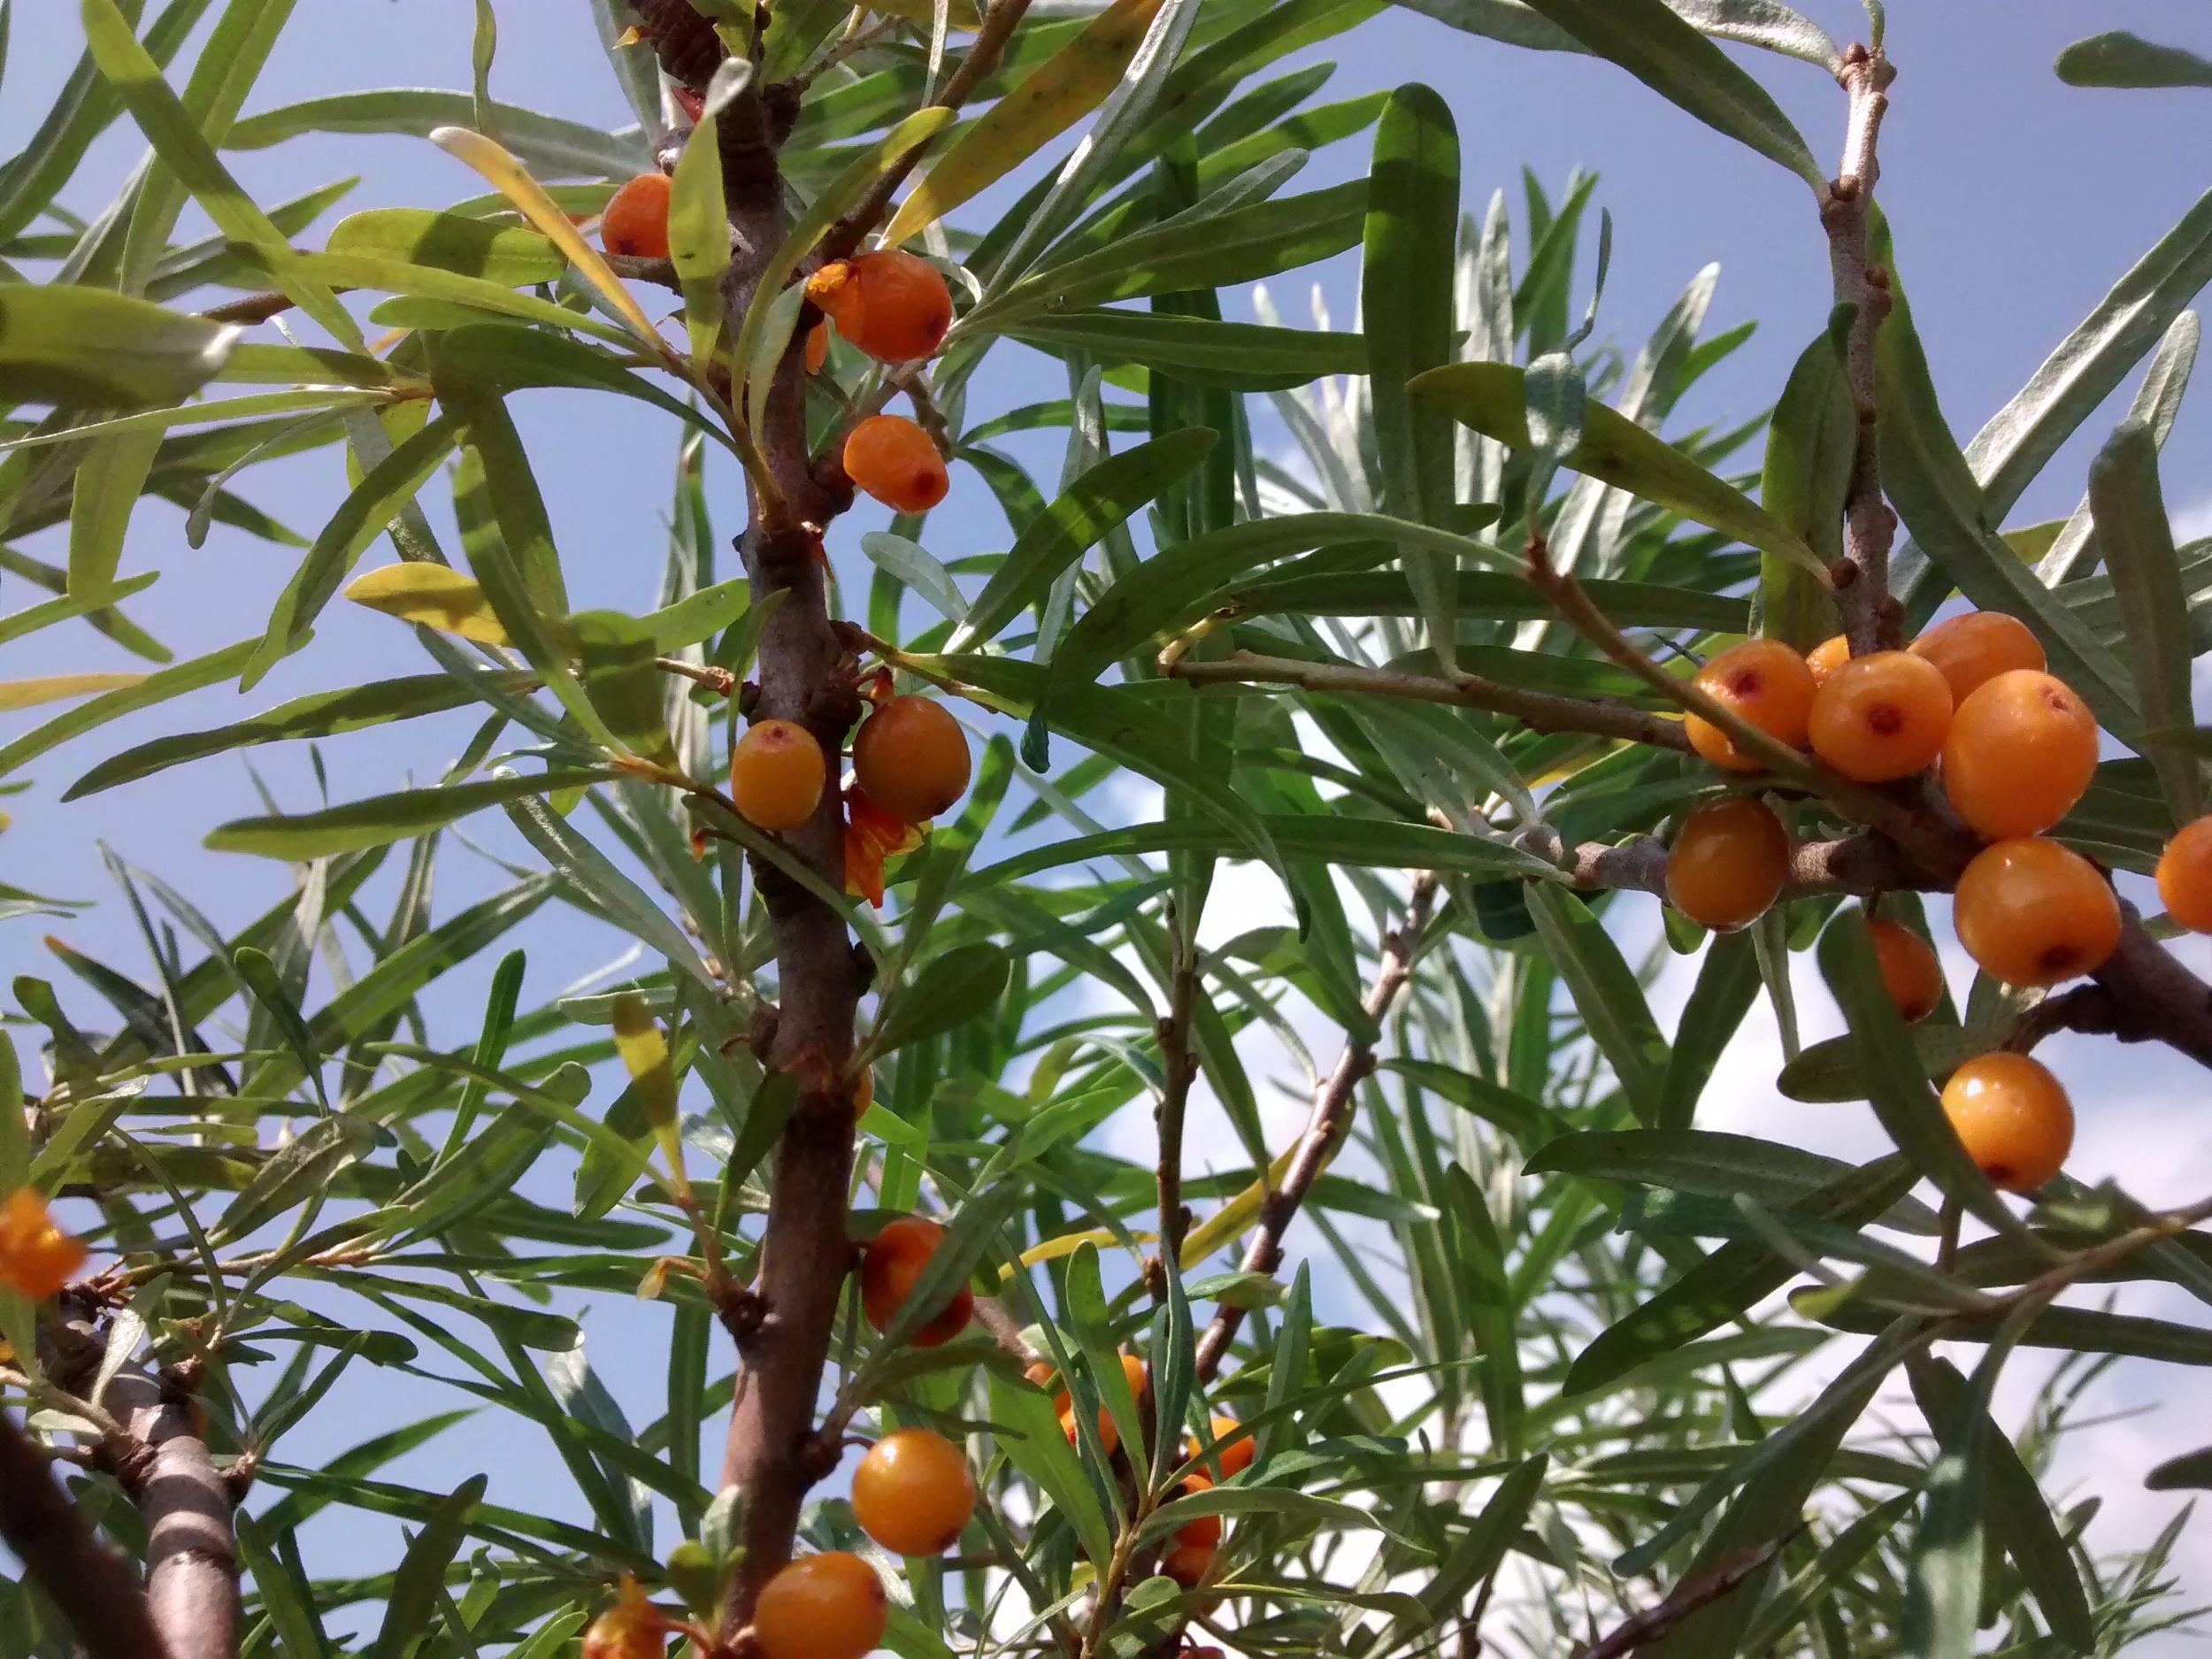 Seaberry fruit, August 2014 - orange is the new orange